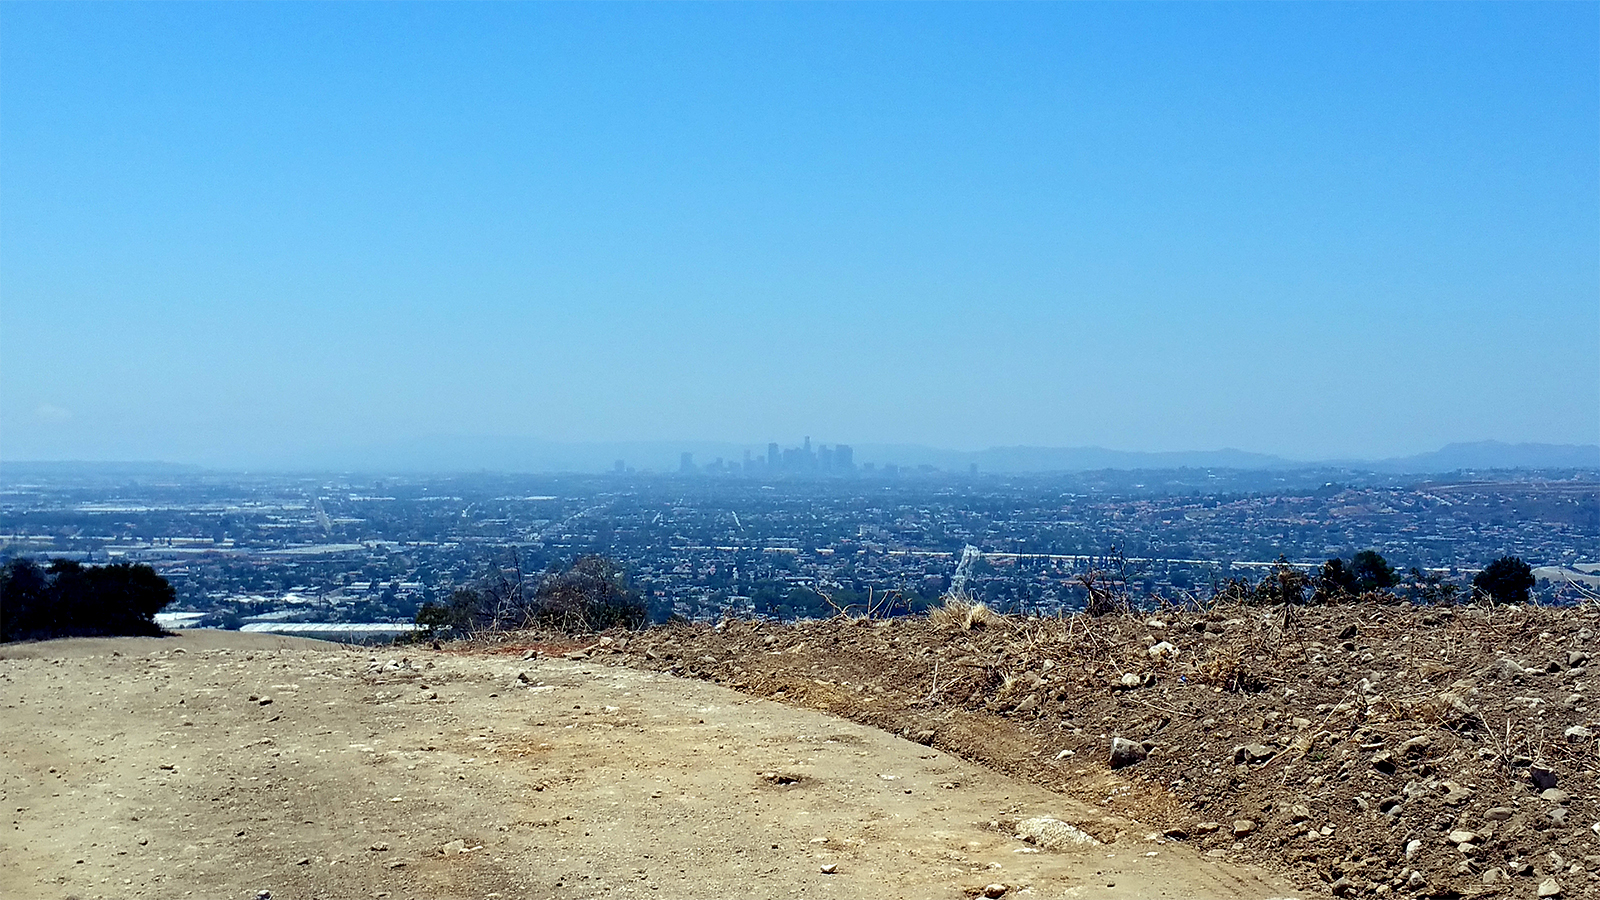 Hellman Trail view of DTLA